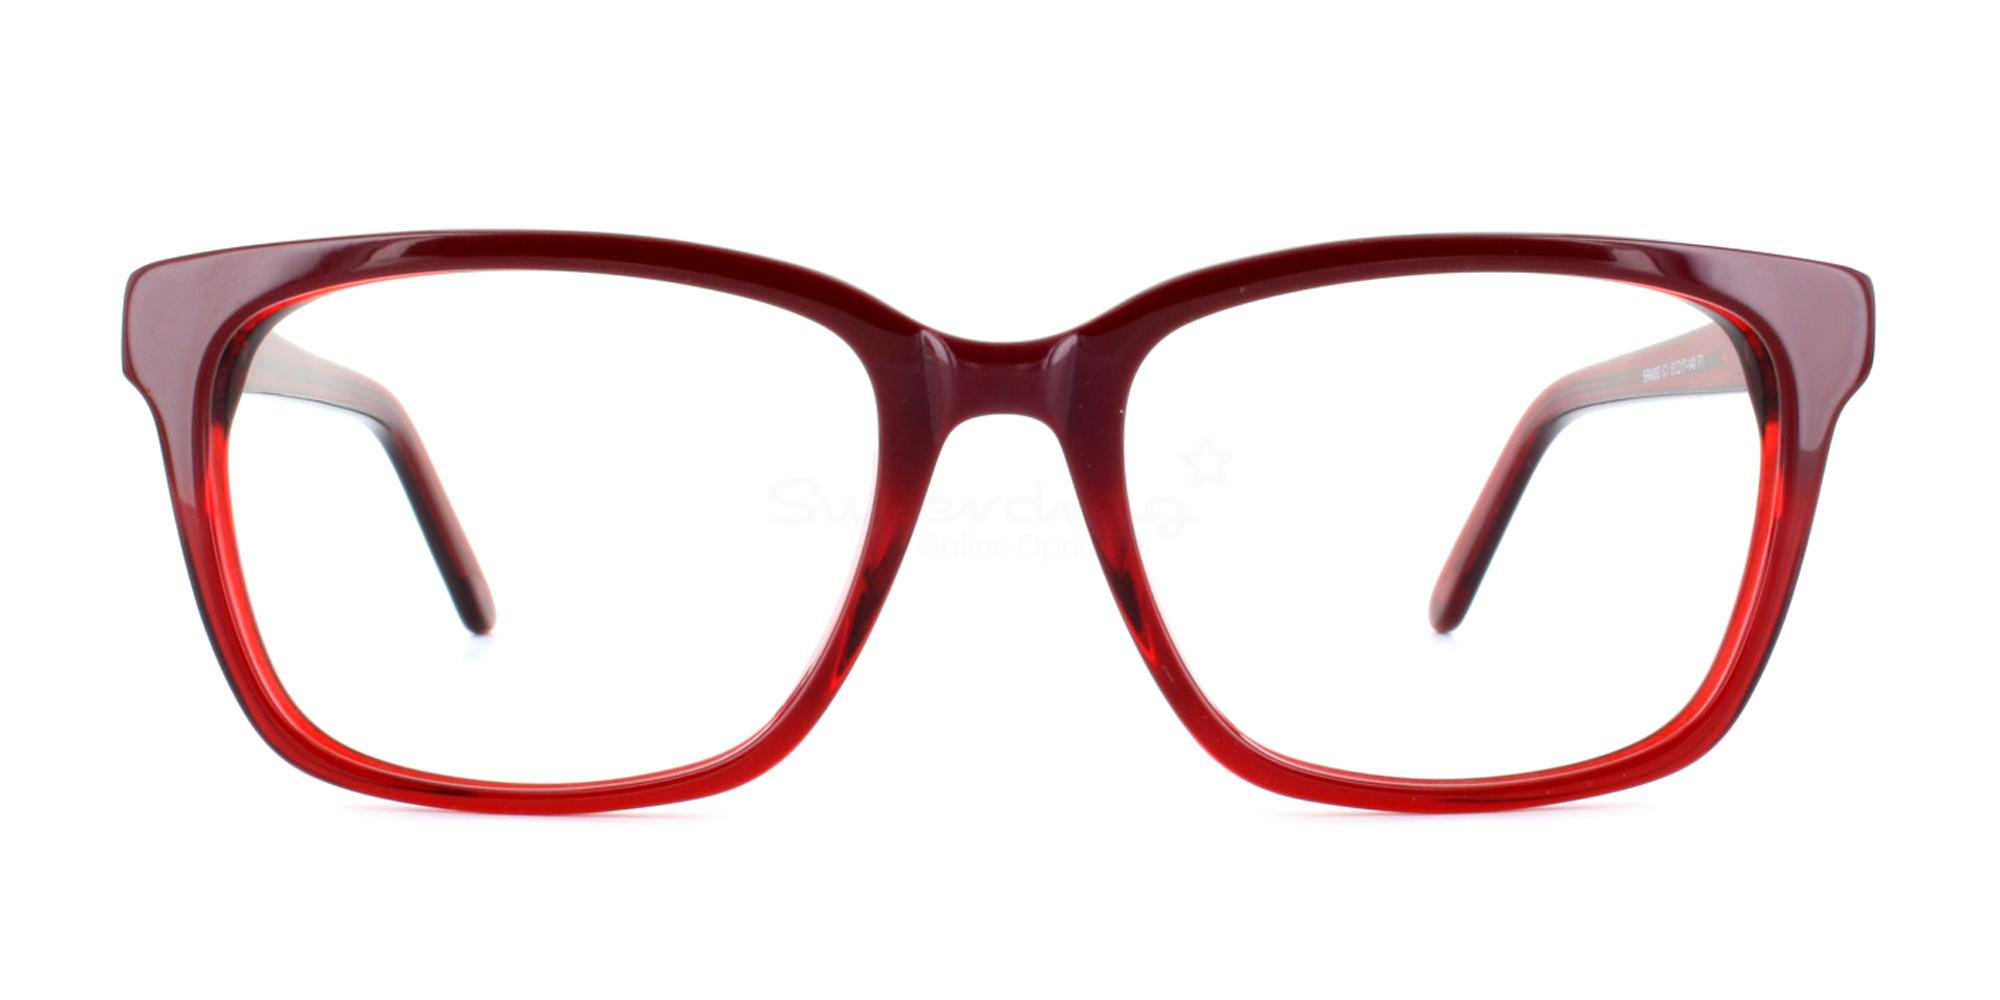 C1 SRA093 Glasses, Neon